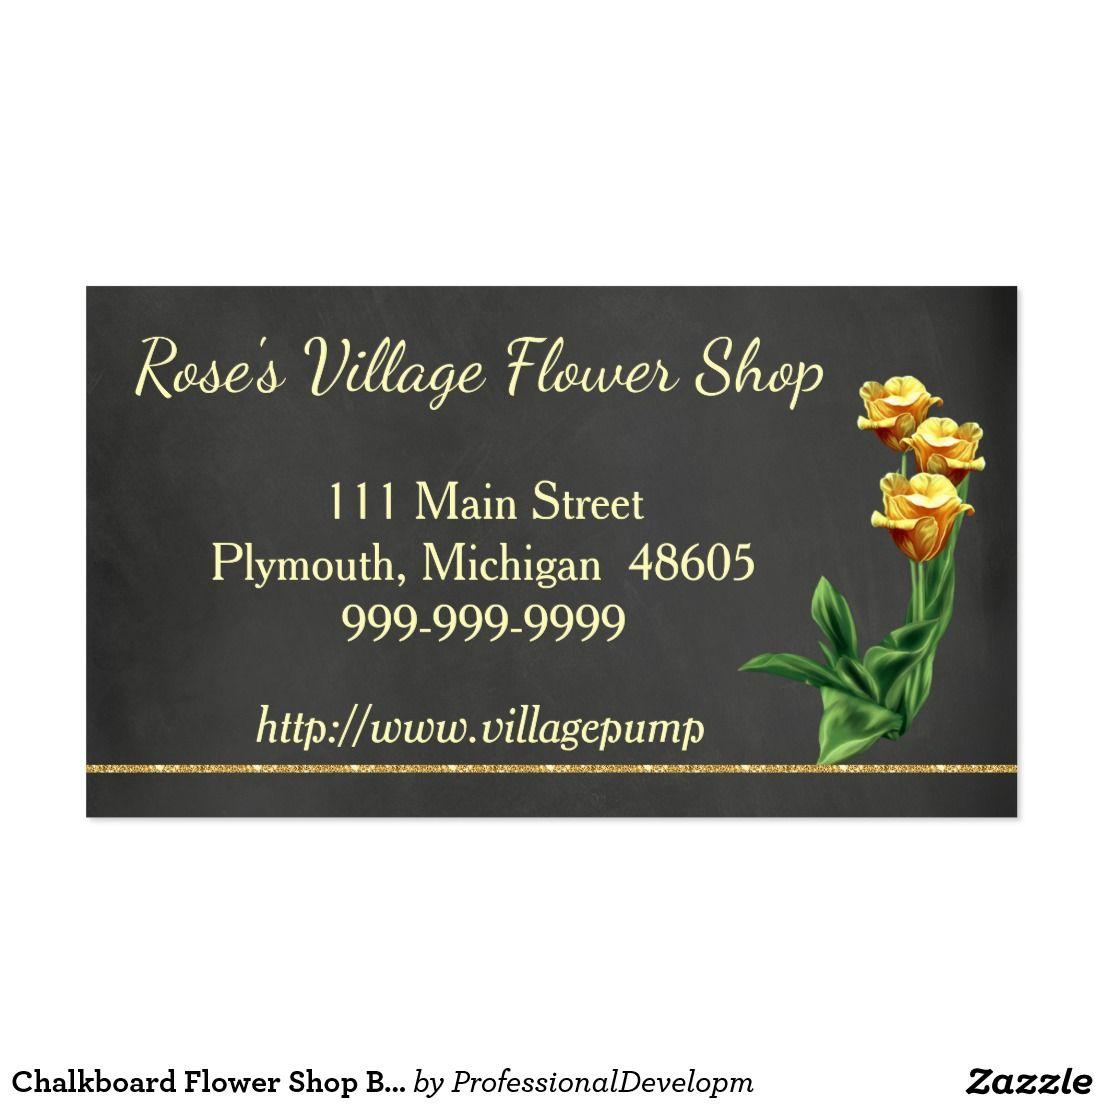 Chalkboard Flower Shop Business Card Yellow Roses Zazzle Com Chalkboard Flowers Chalkboard Wedding Invitations Flower Shop